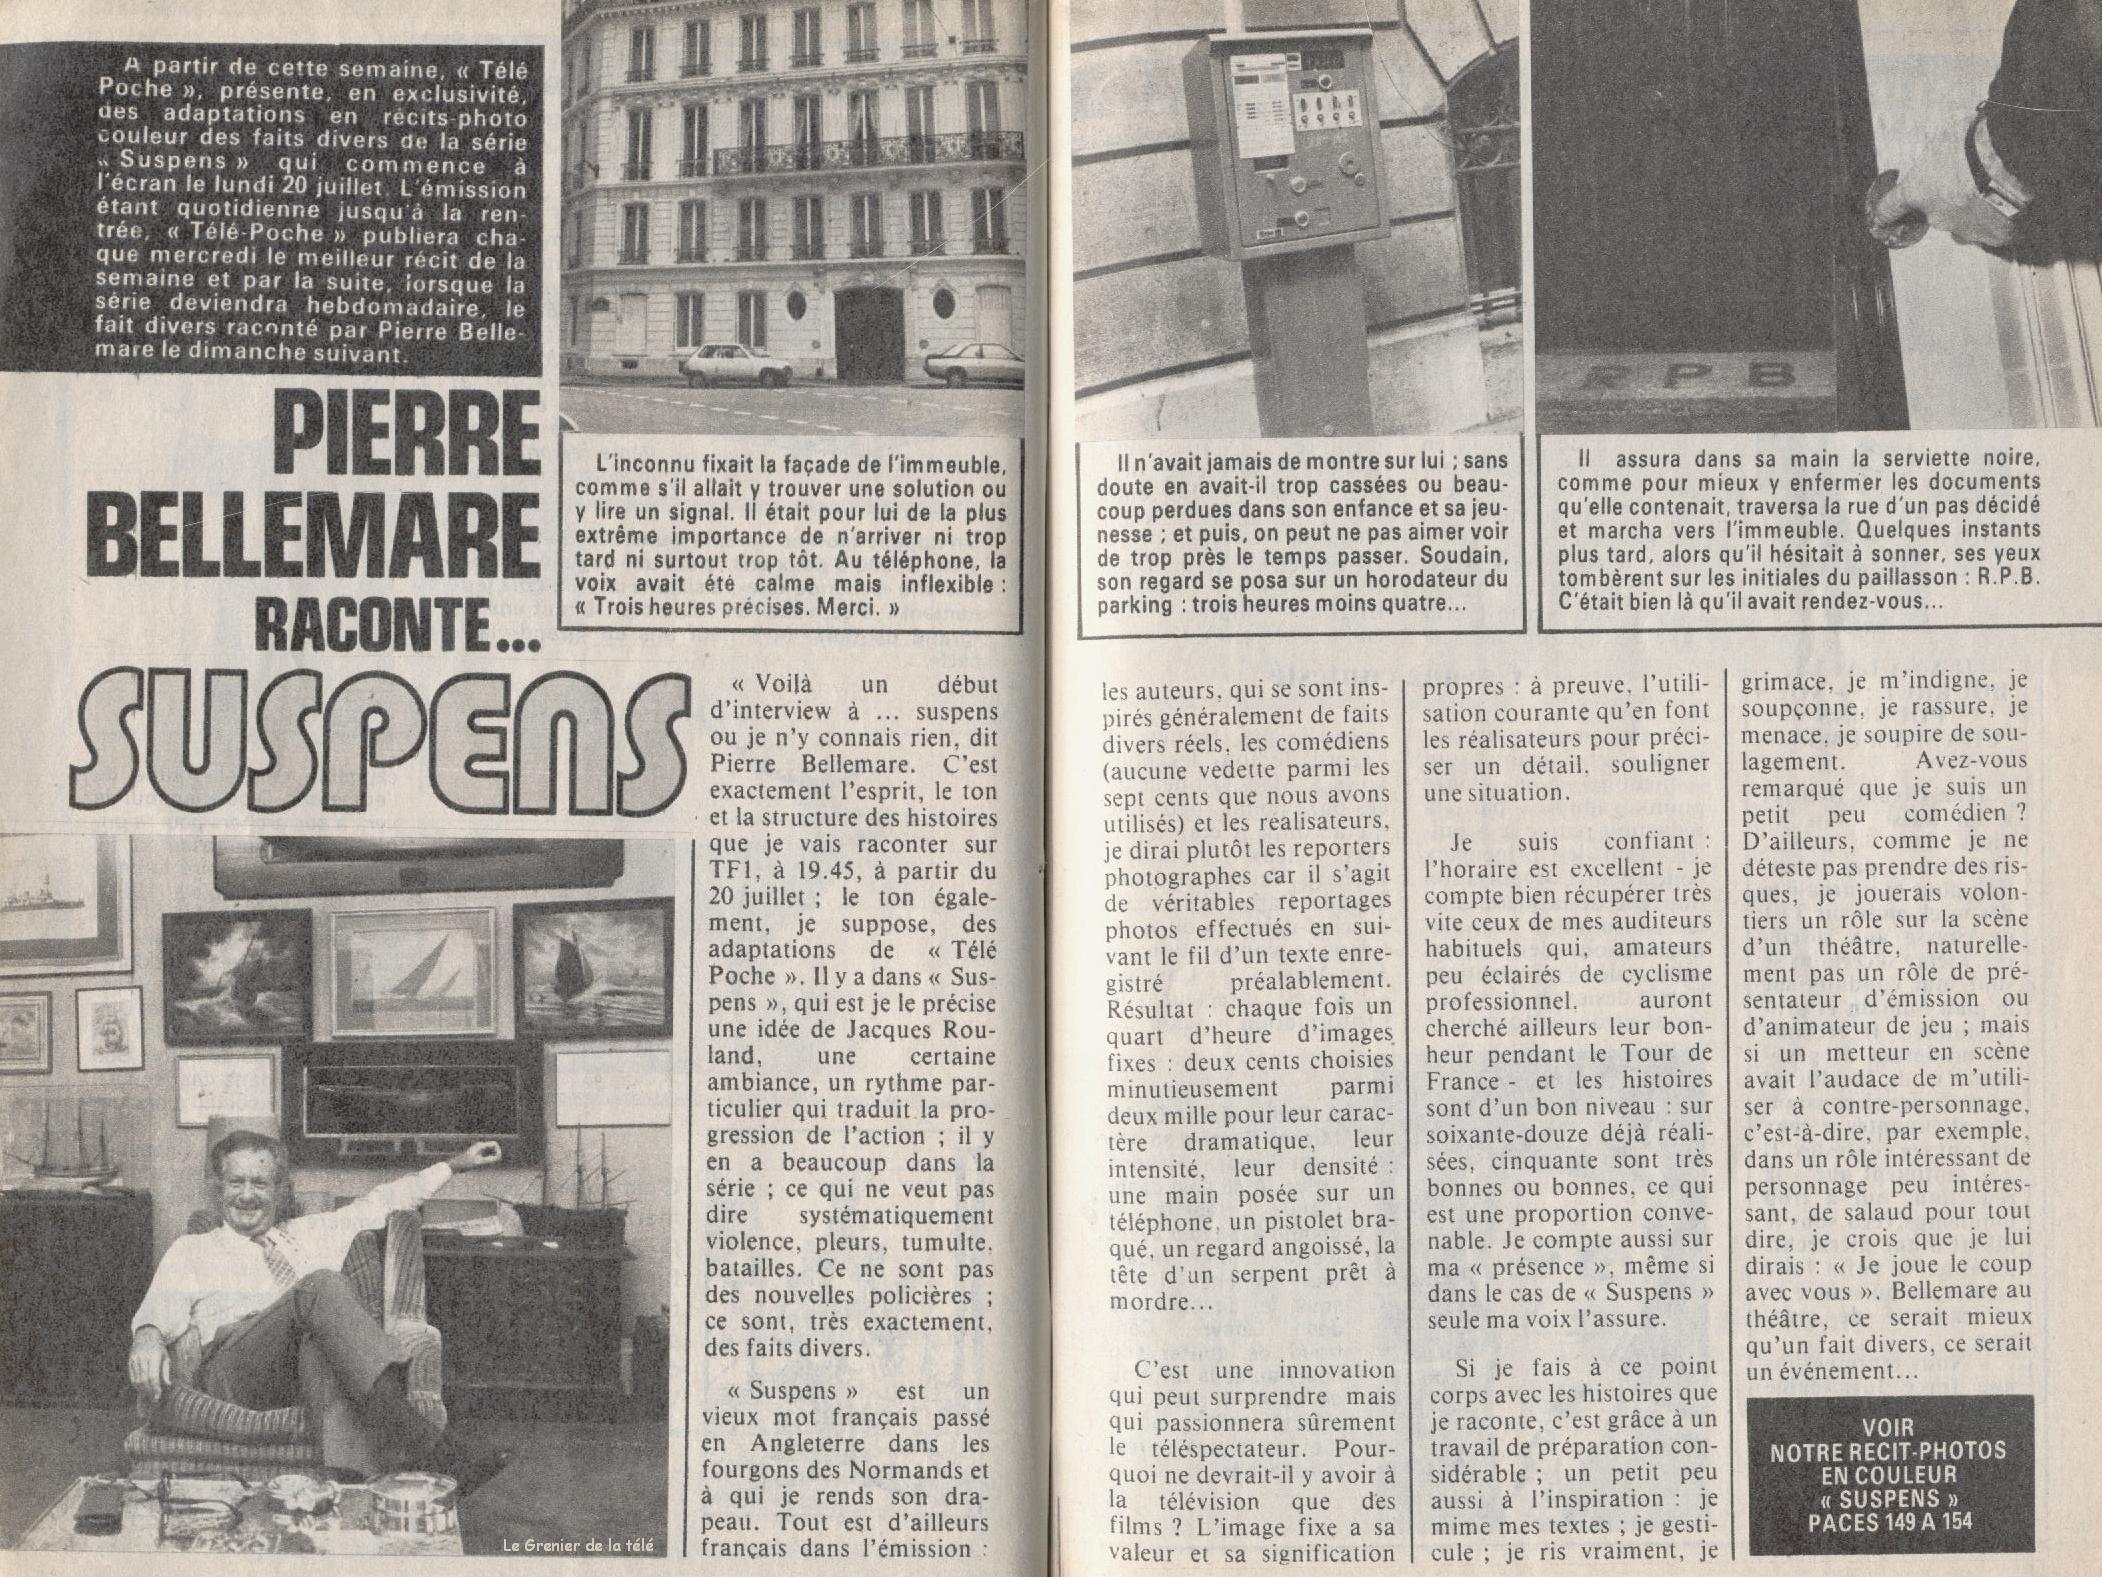 http://grenierdelatv.free.fr/bellemareracontetpjuillet198102.jpg